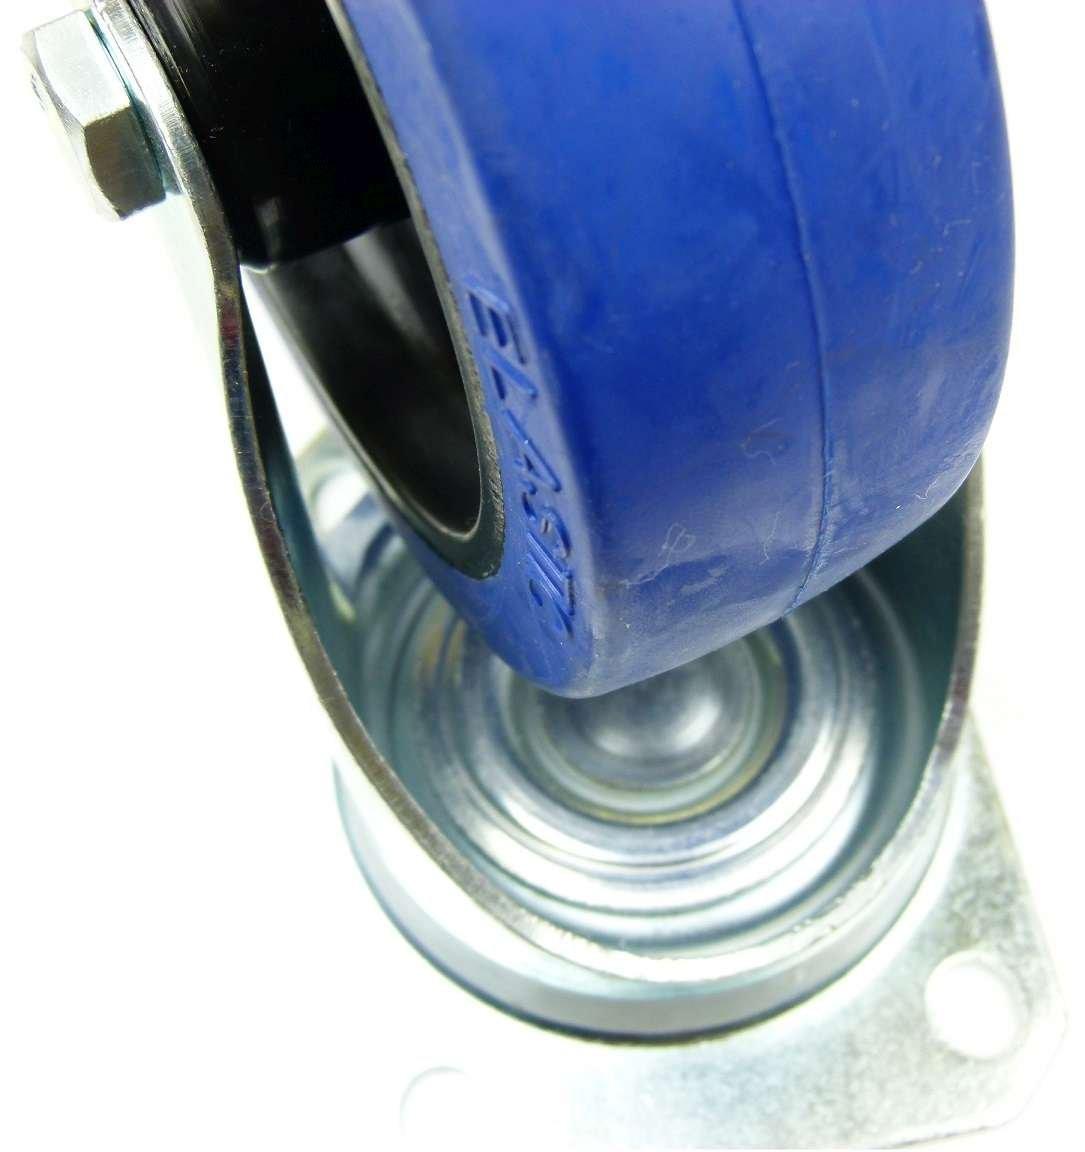 INDUSTIREQALIT/ÄT 2 St/ück 125mm Blue Wheels Lenkrollen Transportrollen 200kg Rad